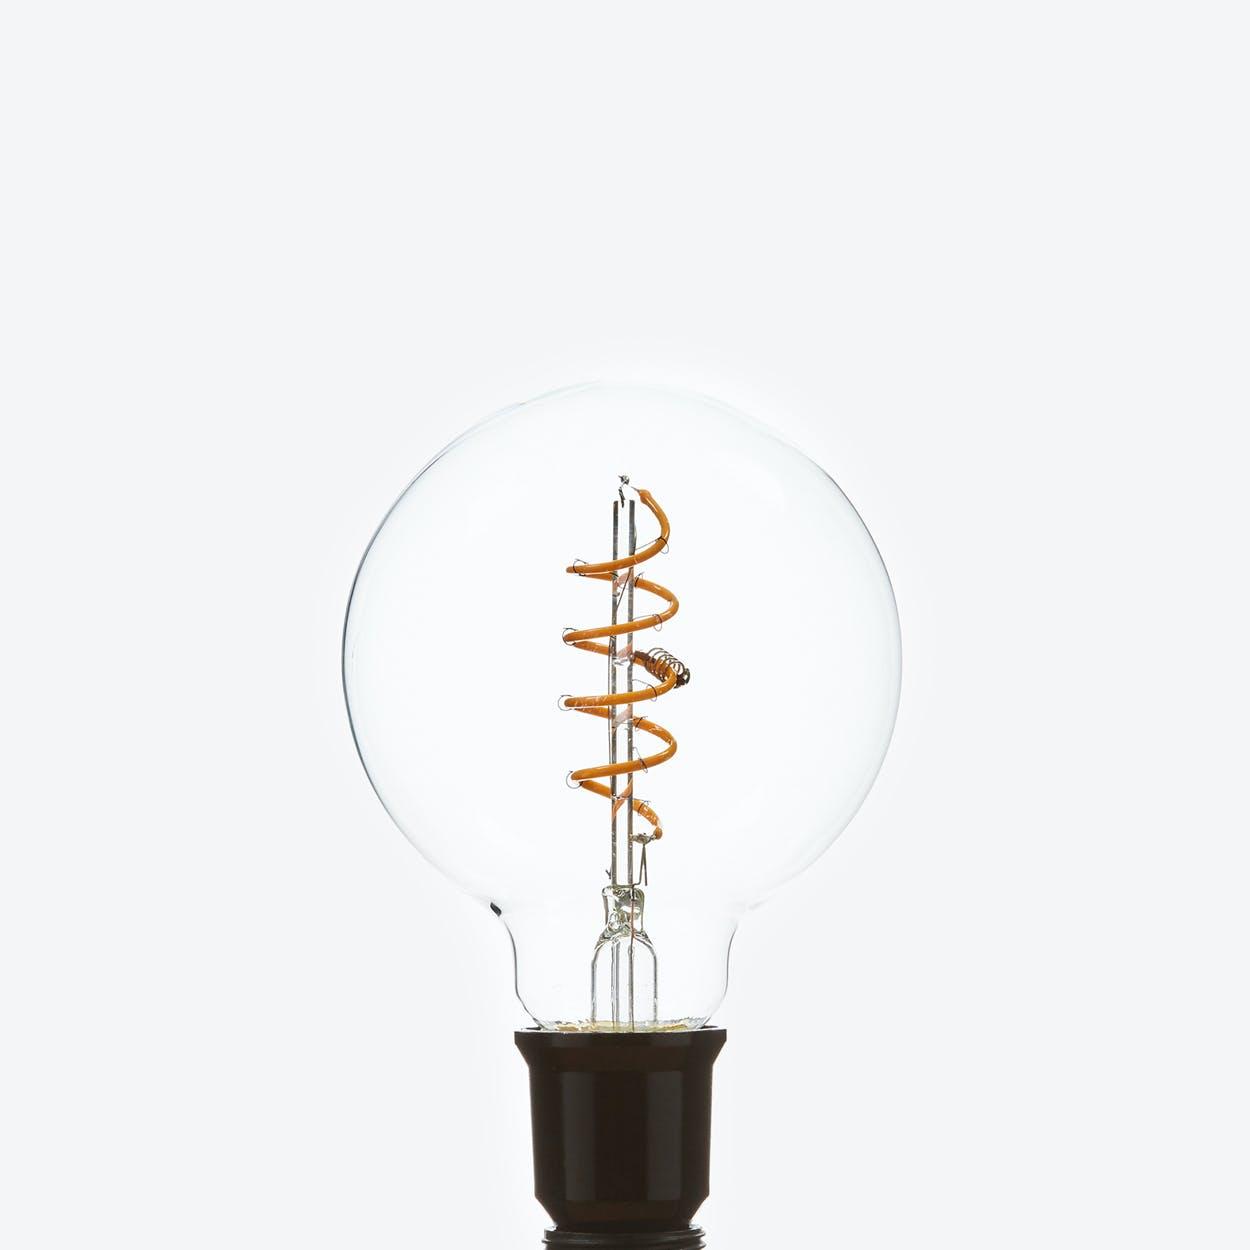 Luna LED Filament Light Bulb